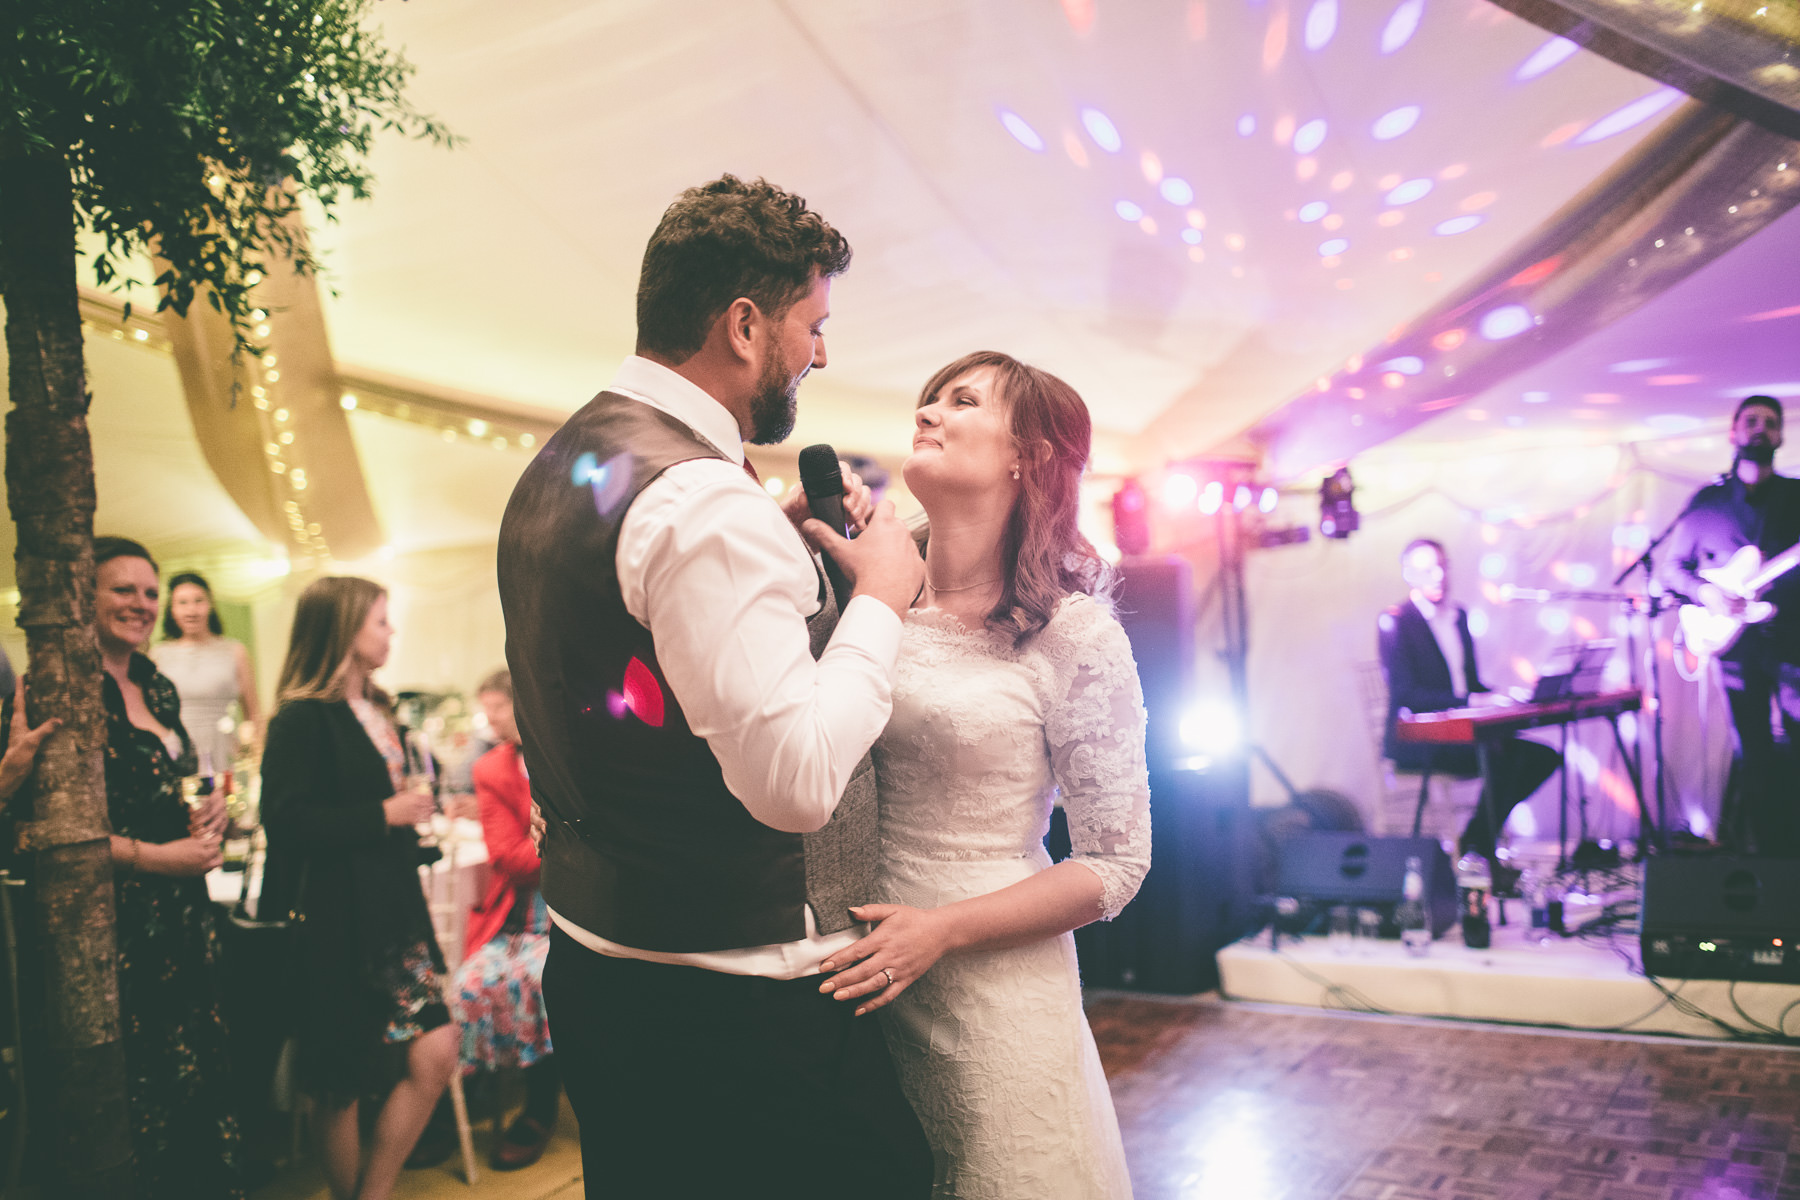 Pamber-Place-wedding-photography-basingstoke-hampshire-232